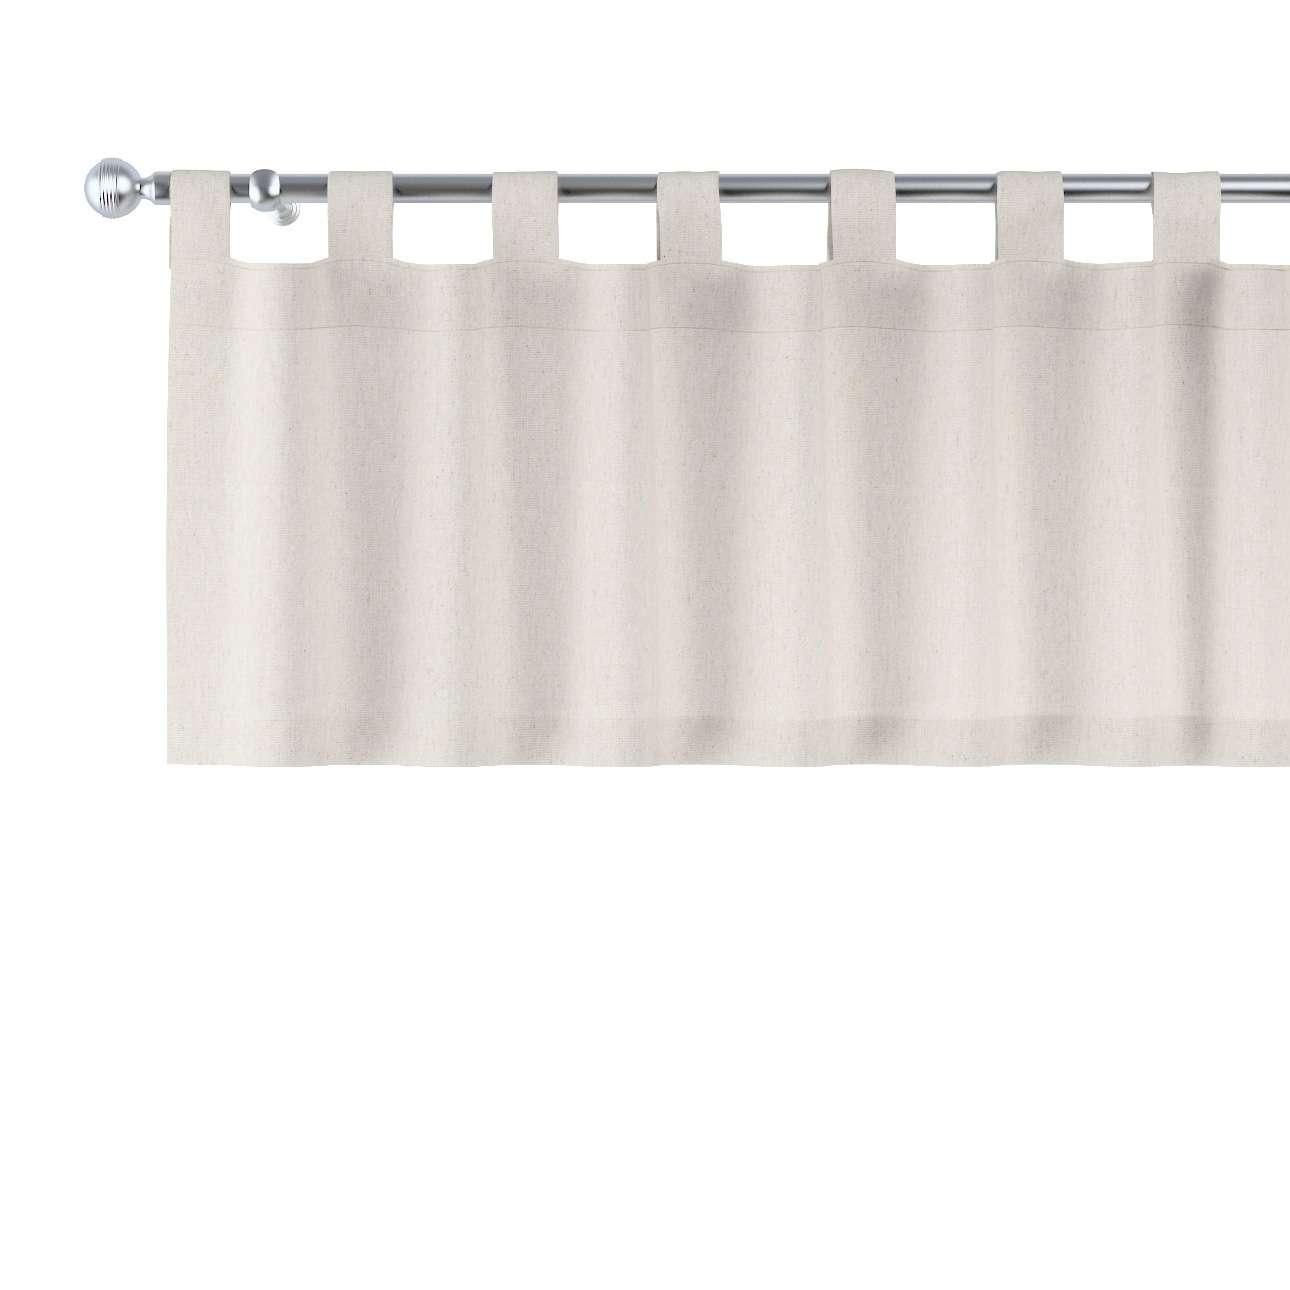 Lambrekin na szelkach 130x40cm w kolekcji Loneta, tkanina: 133-65